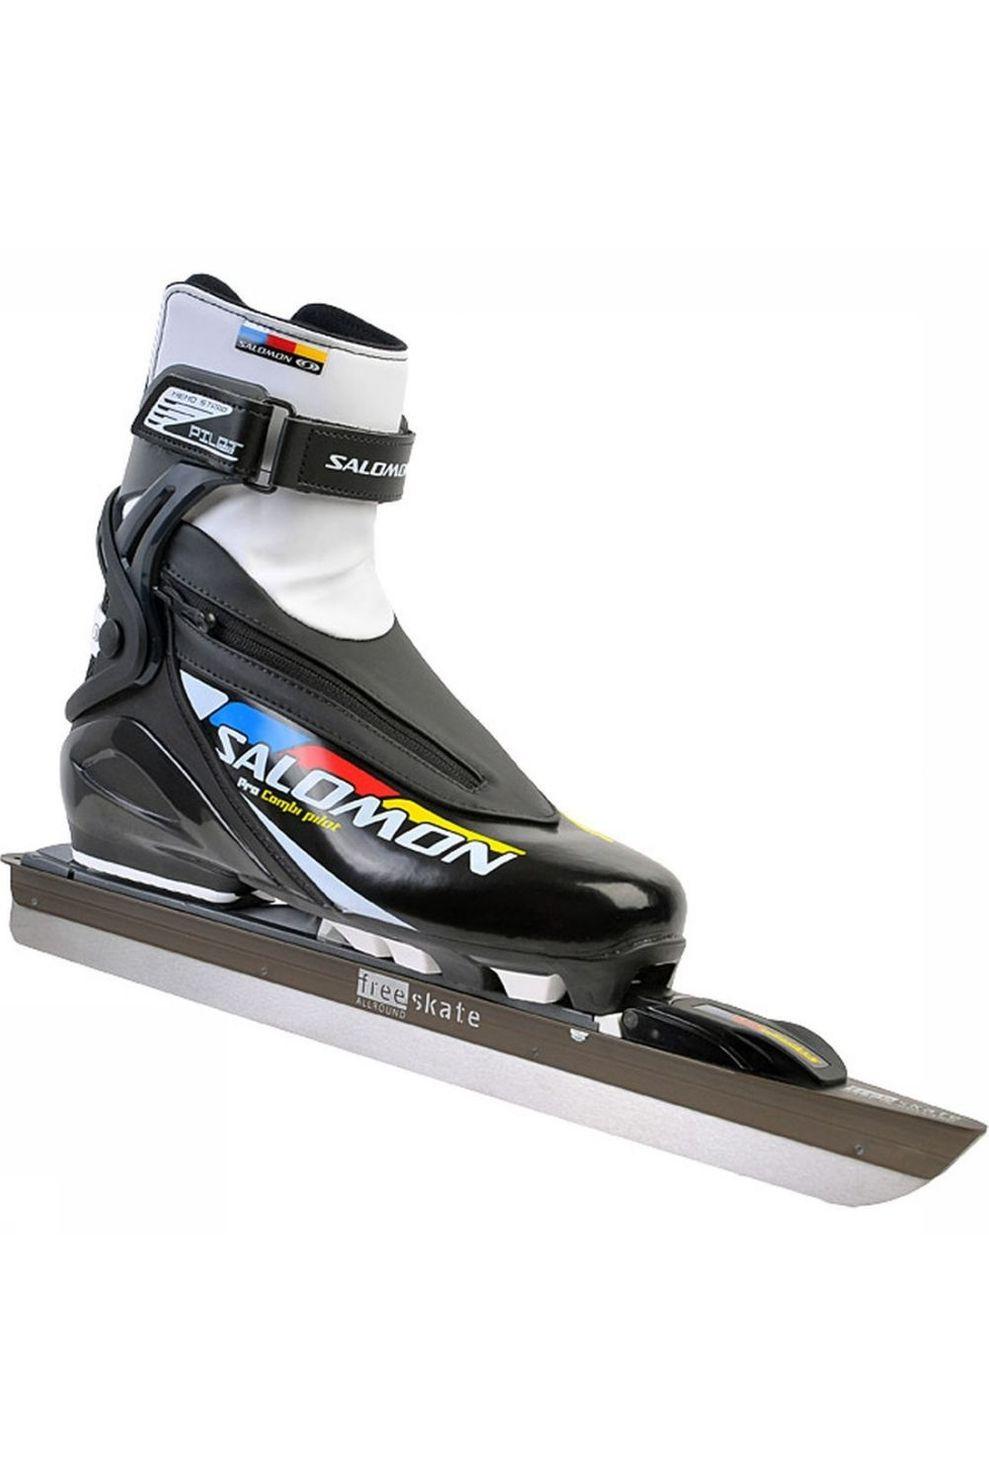 Free-Skate Allround XL + Salomon Pro Combi Pilot Schaats XL Zwart/Wit